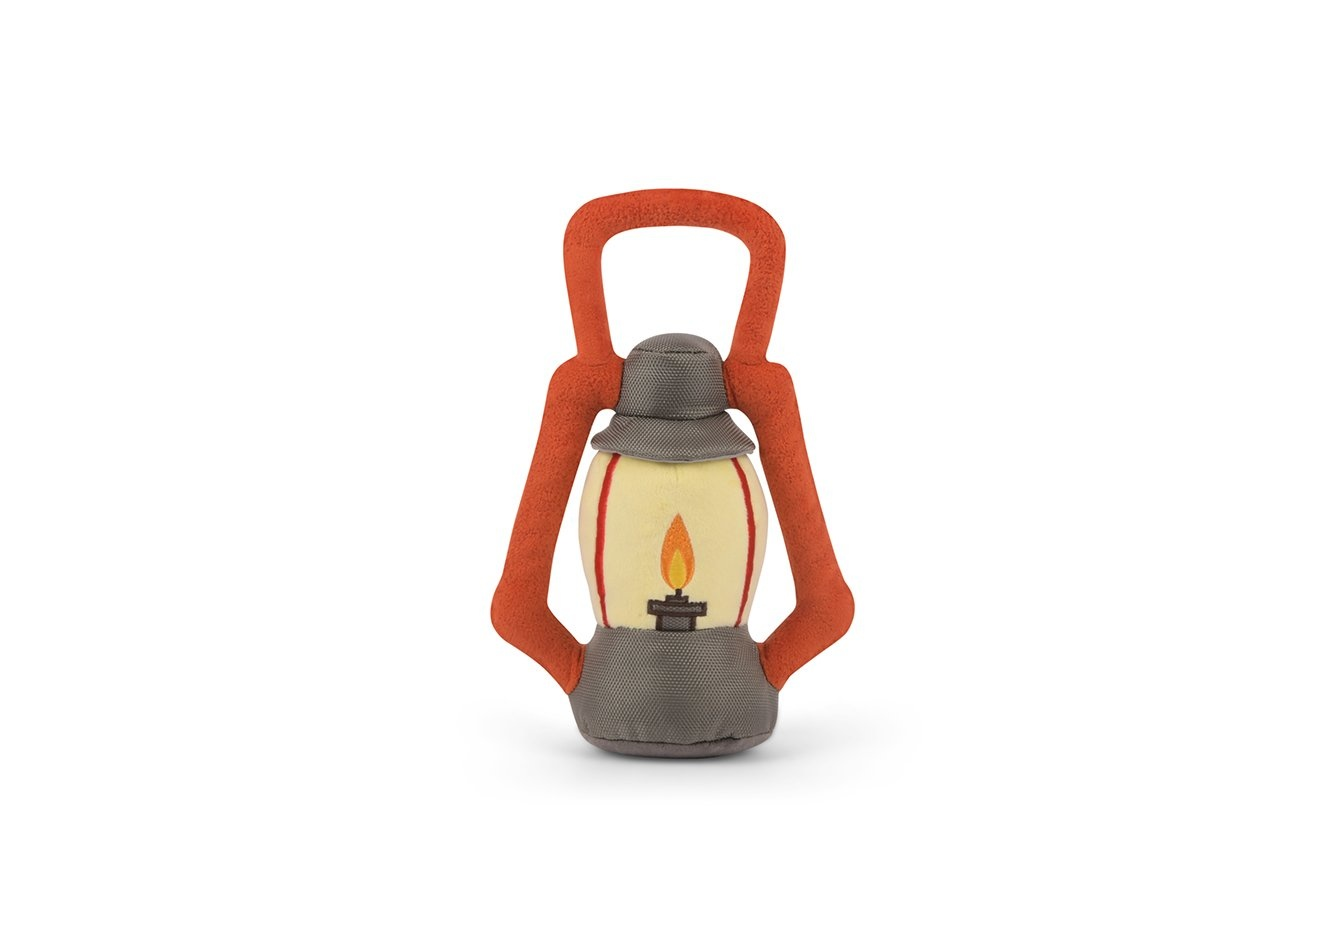 PLAY Camp Corbin Pack Leader Lantern Toy